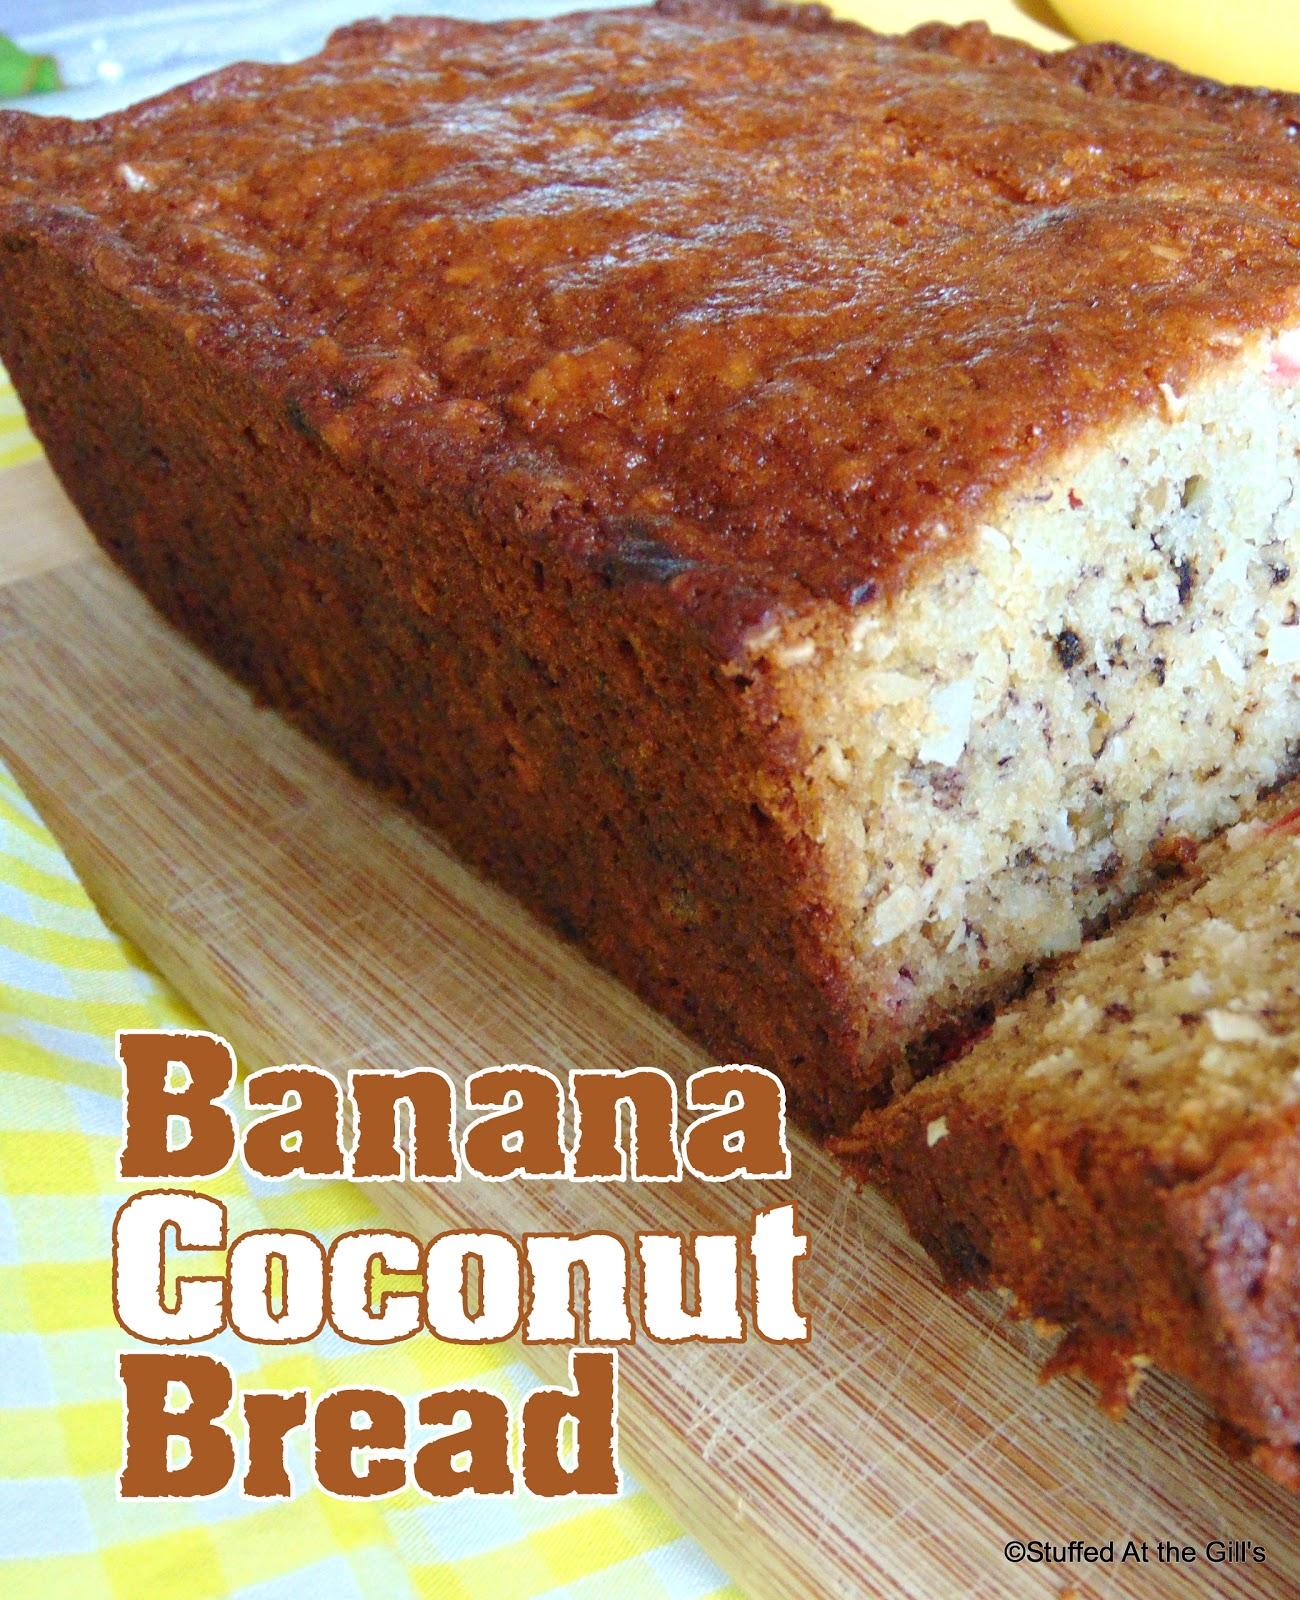 Stuffed At the Gill's: Banana Coconut Bread